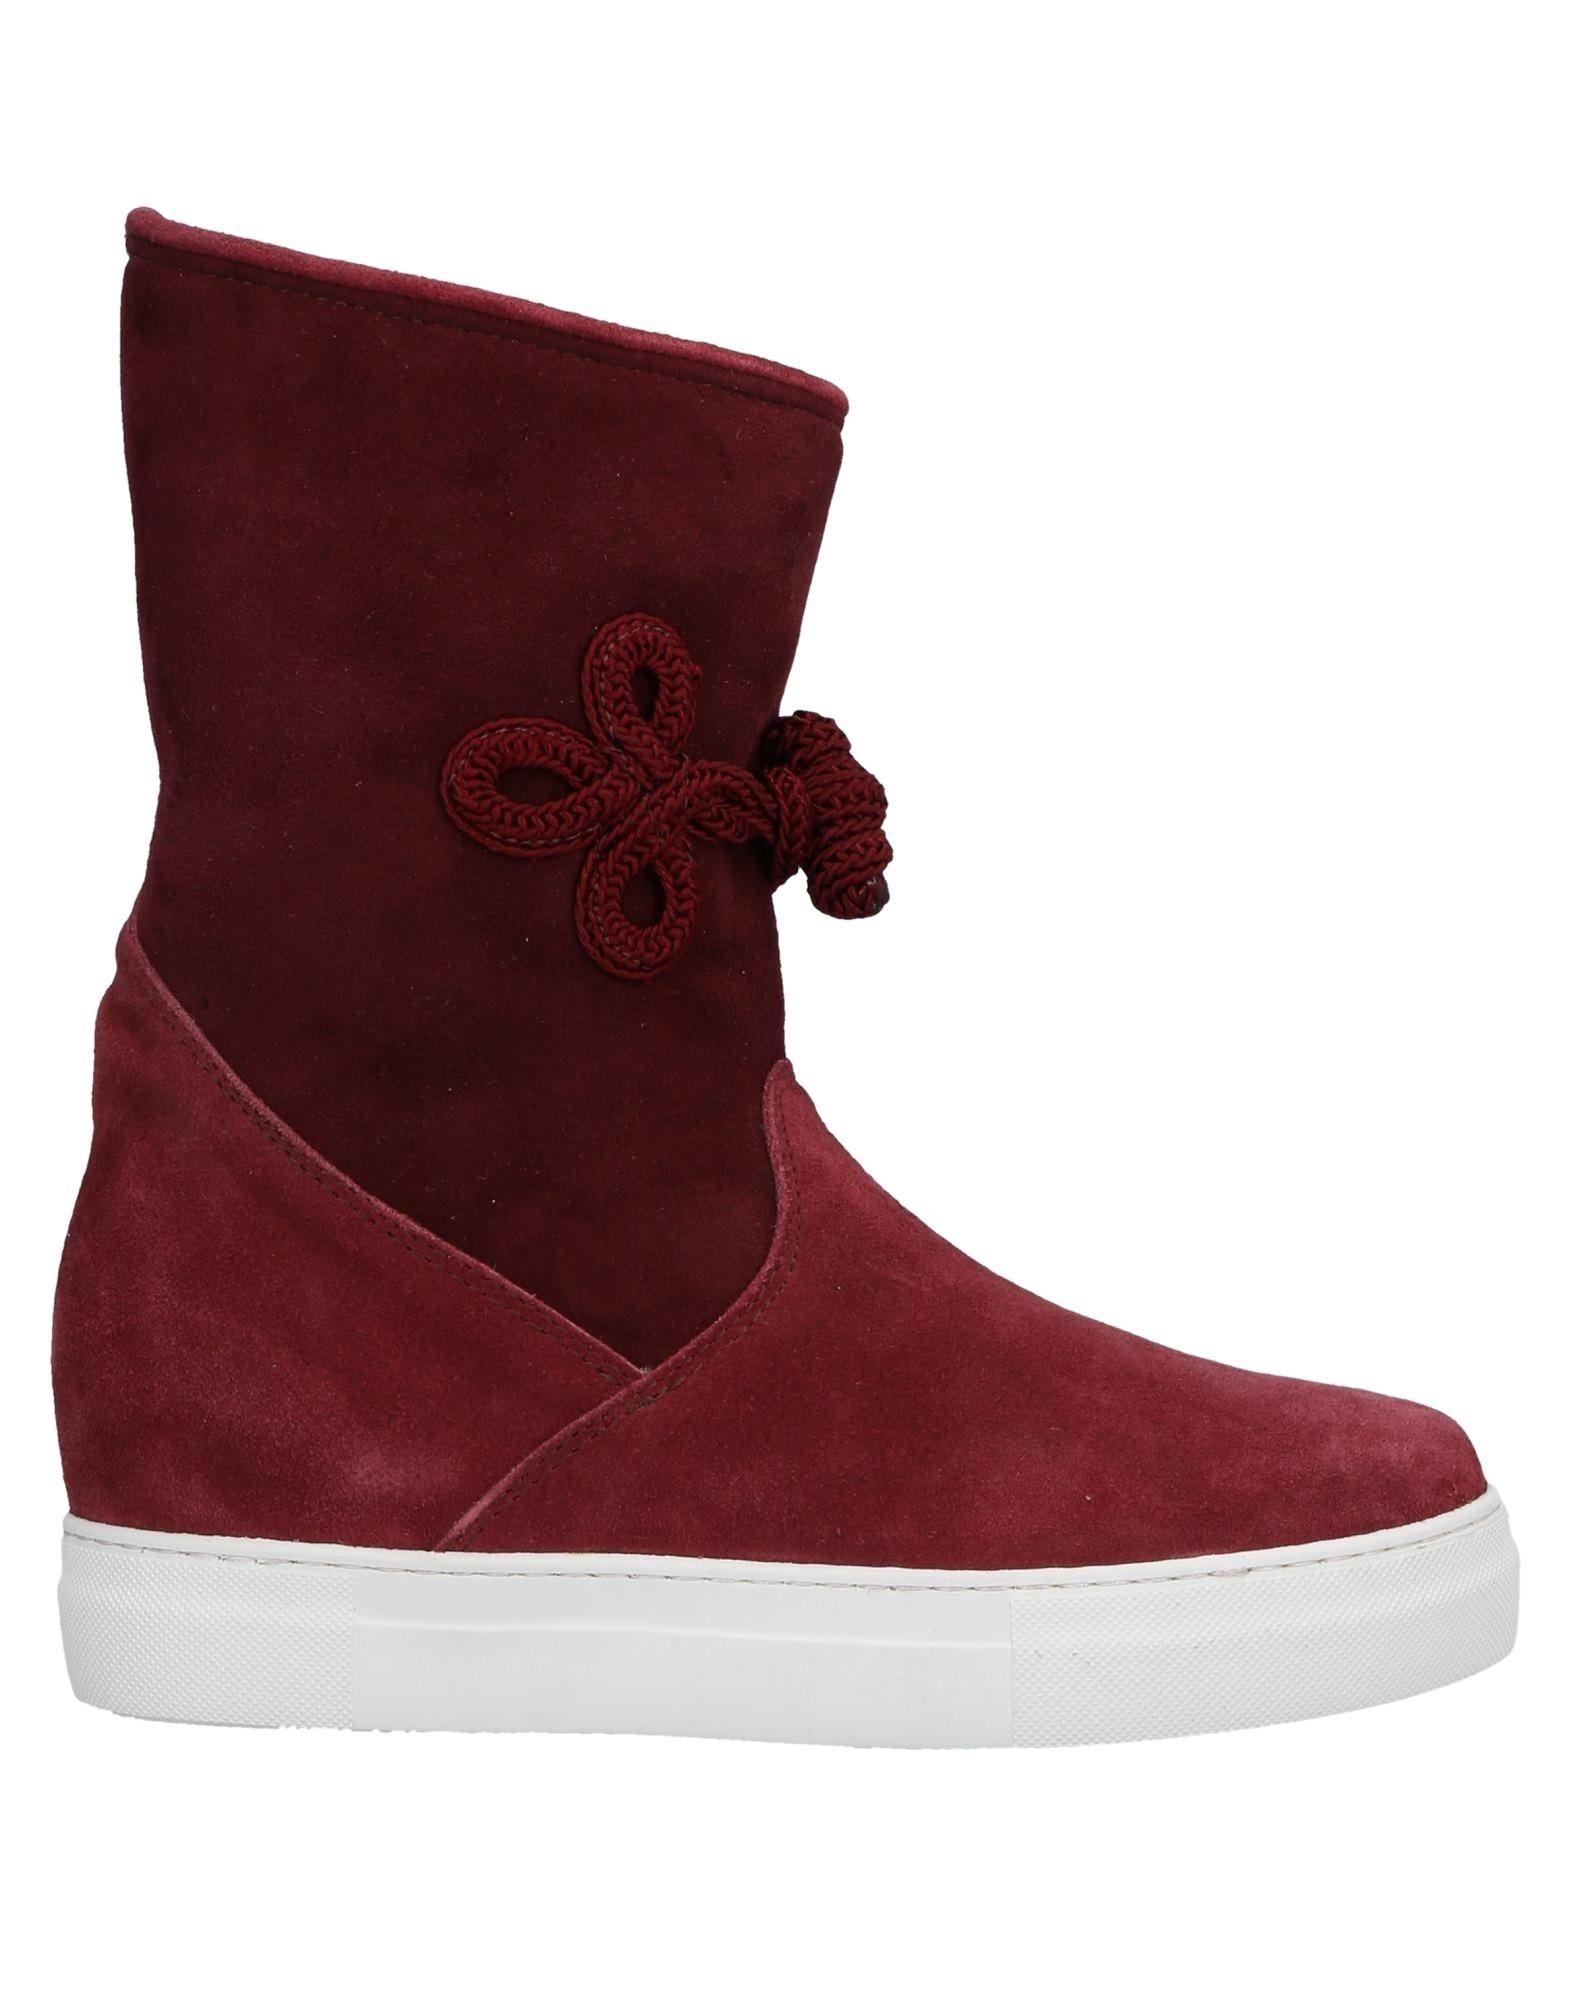 Rabatt Damen Schuhe Passion Blanche Stiefelette Damen Rabatt  11217465VF 7eeac9